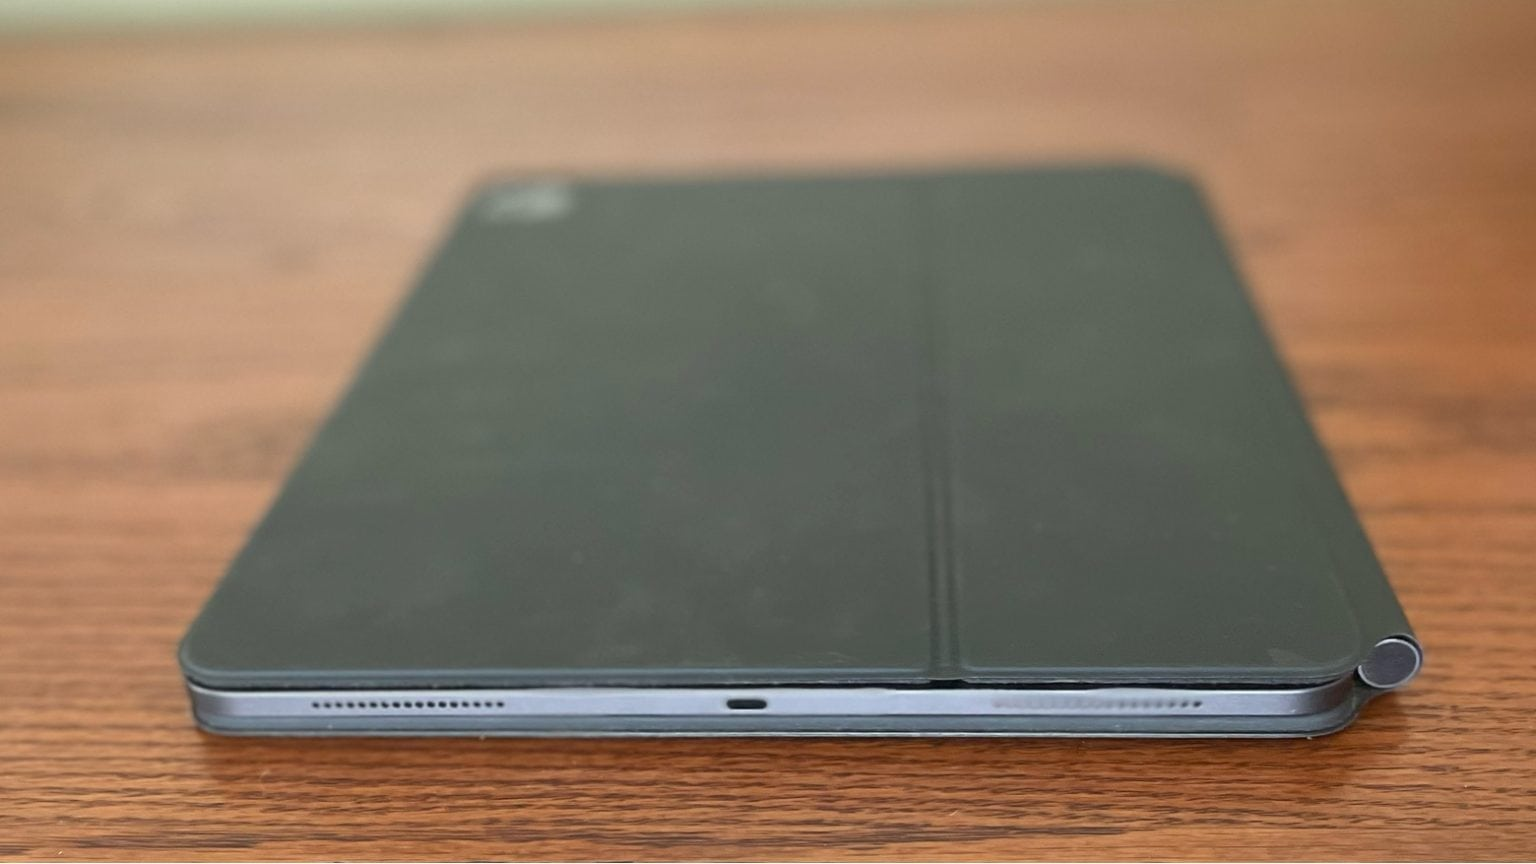 Original Apple Magic Keyboard might not work with 2021 iPad Pro